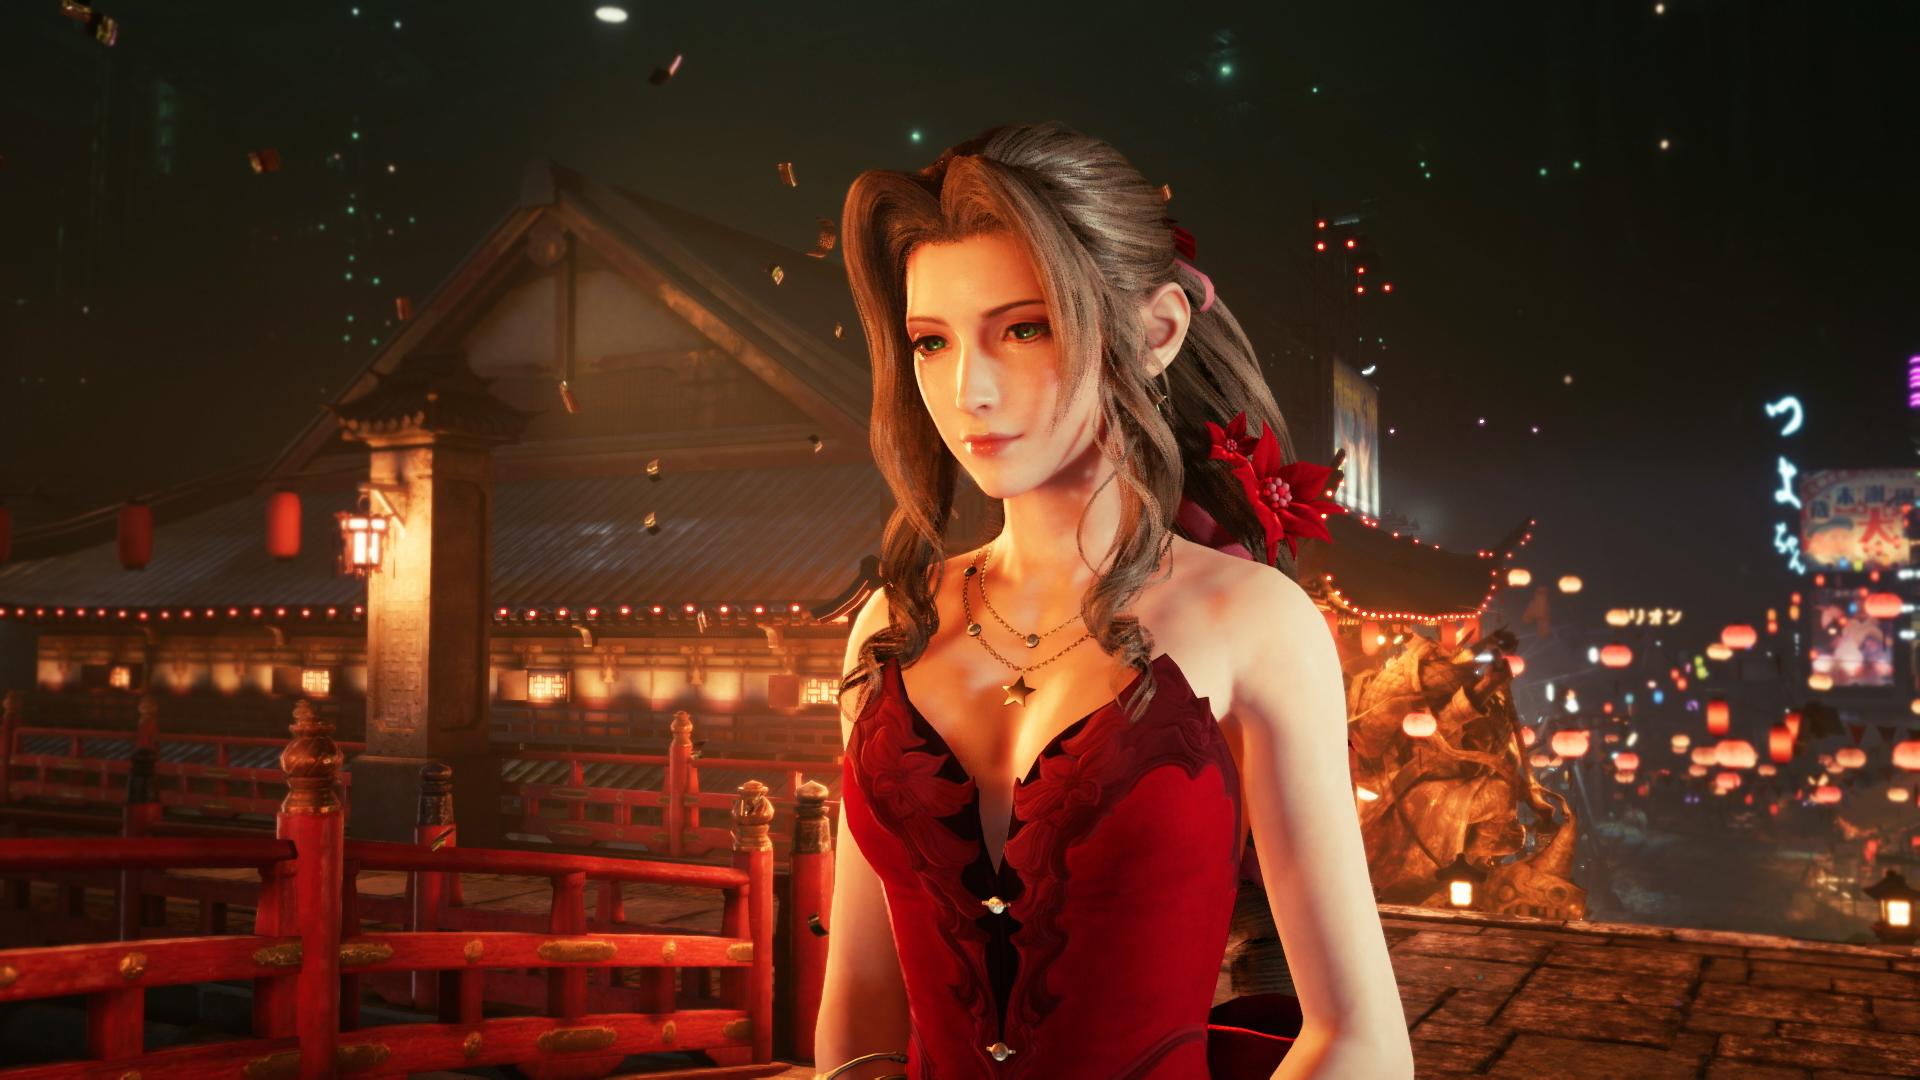 Final Fantasy 7 Remake Aeris